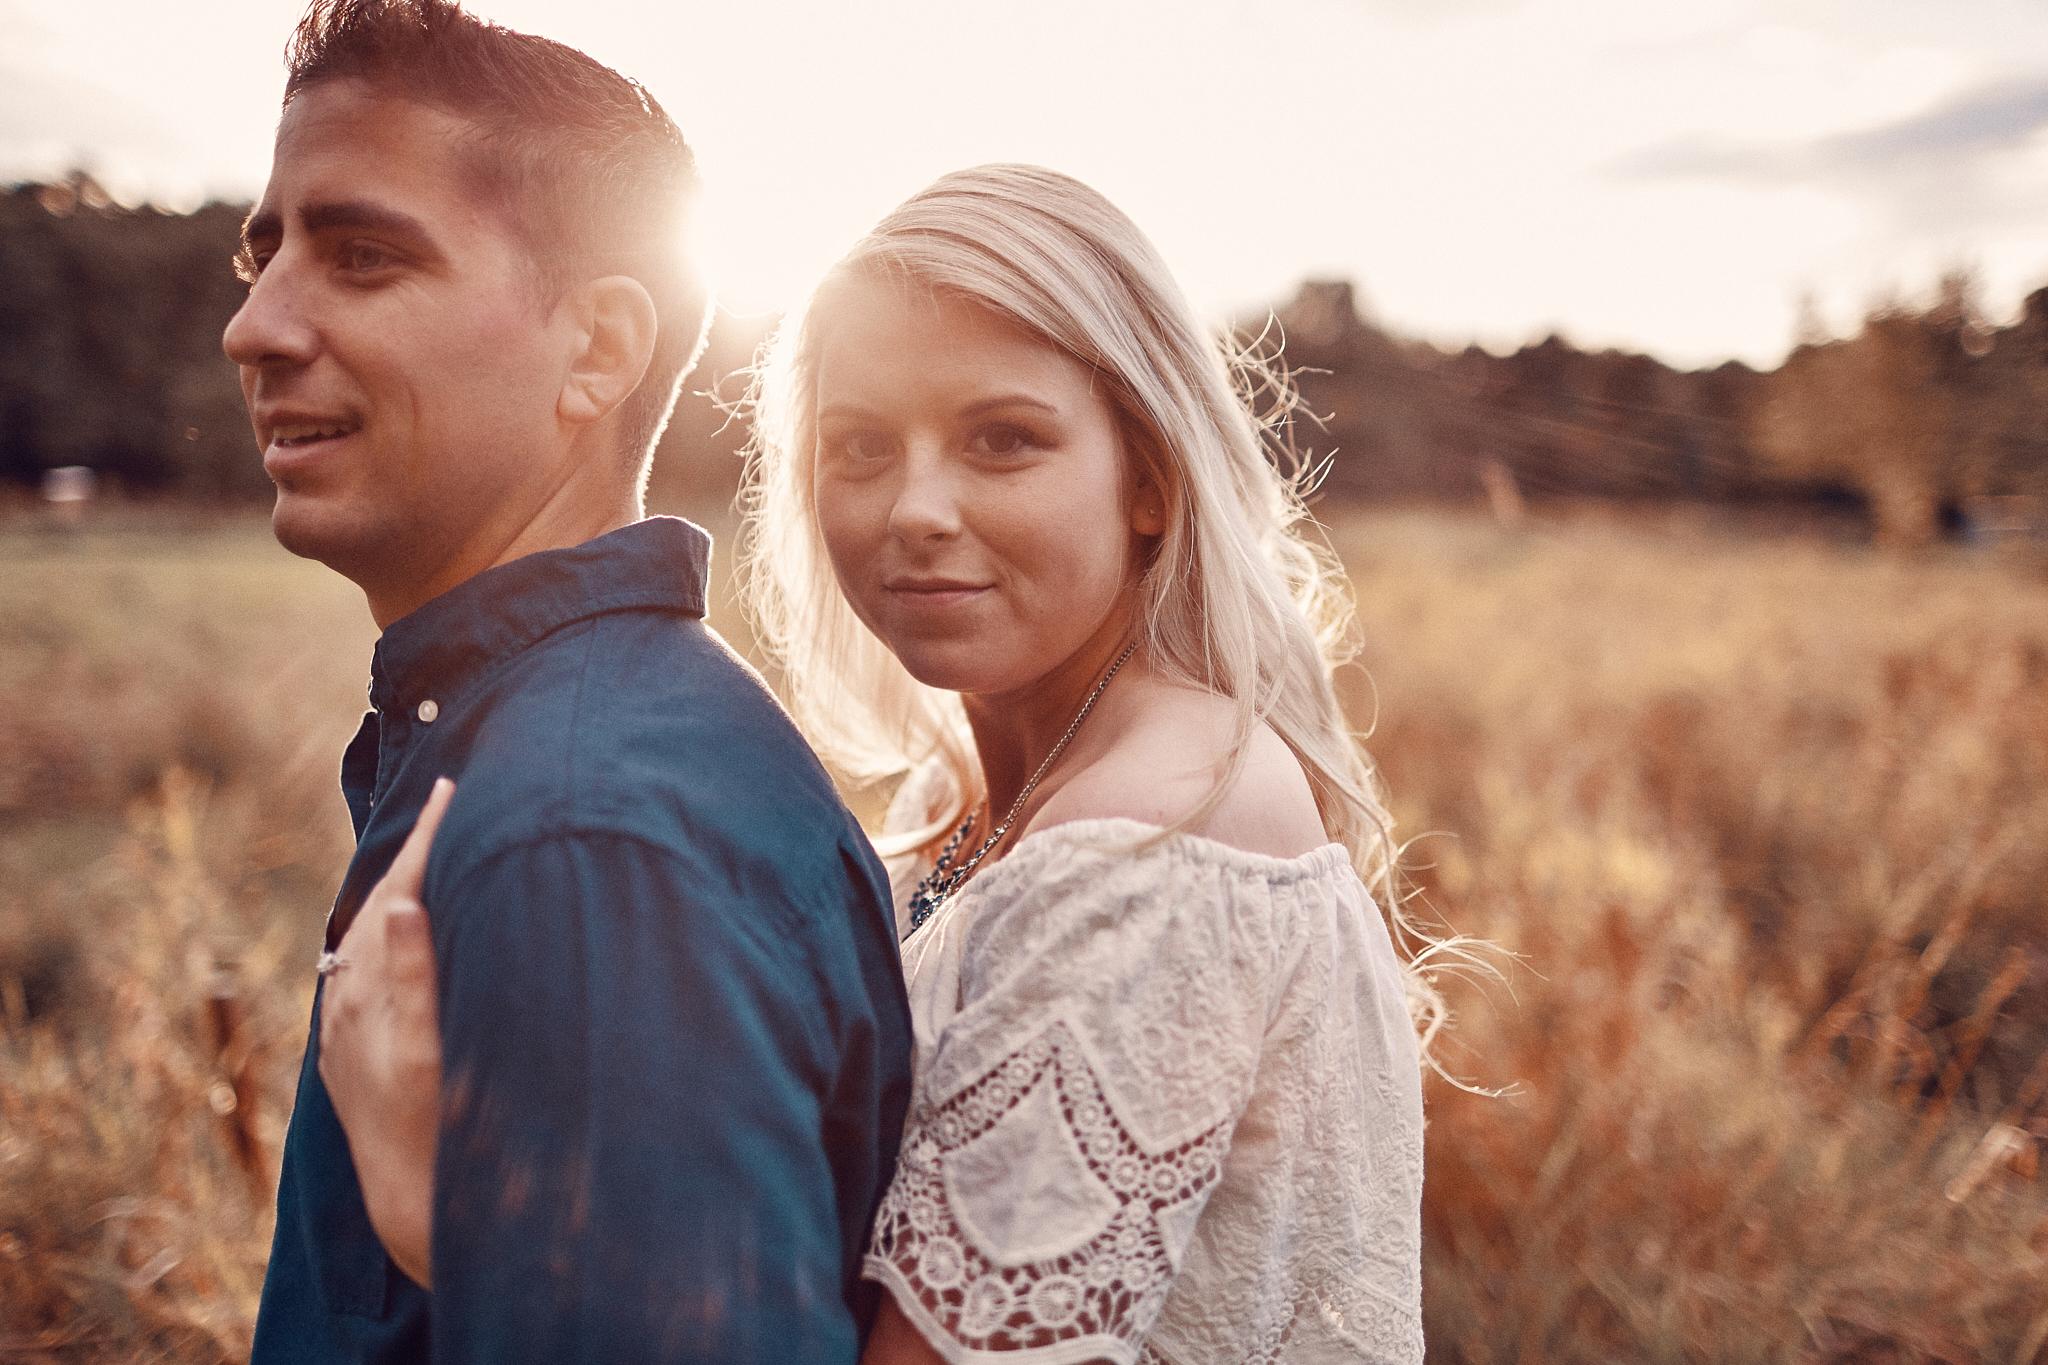 Engagement_Photographer_Twin_Cities_St_Paul_Miinneapolis_Lifestyle_Outdoor_Somethin_Candi_Photography_032.JPG